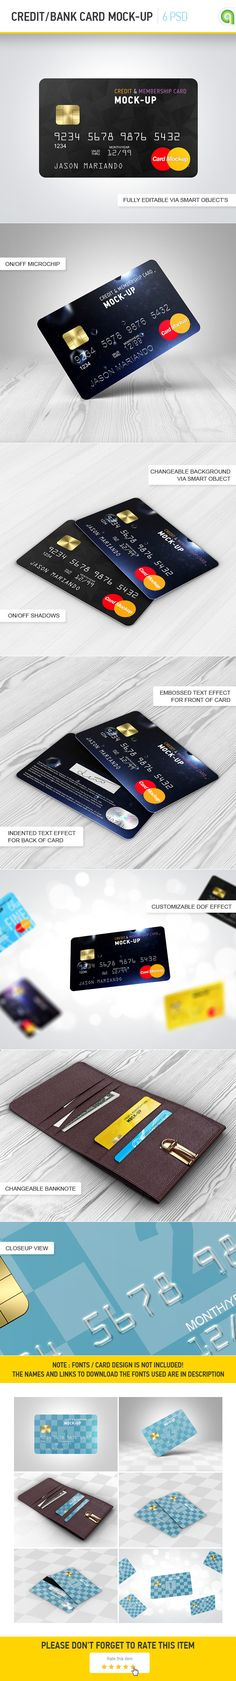 Credit / Bank Card Mockup on Behance